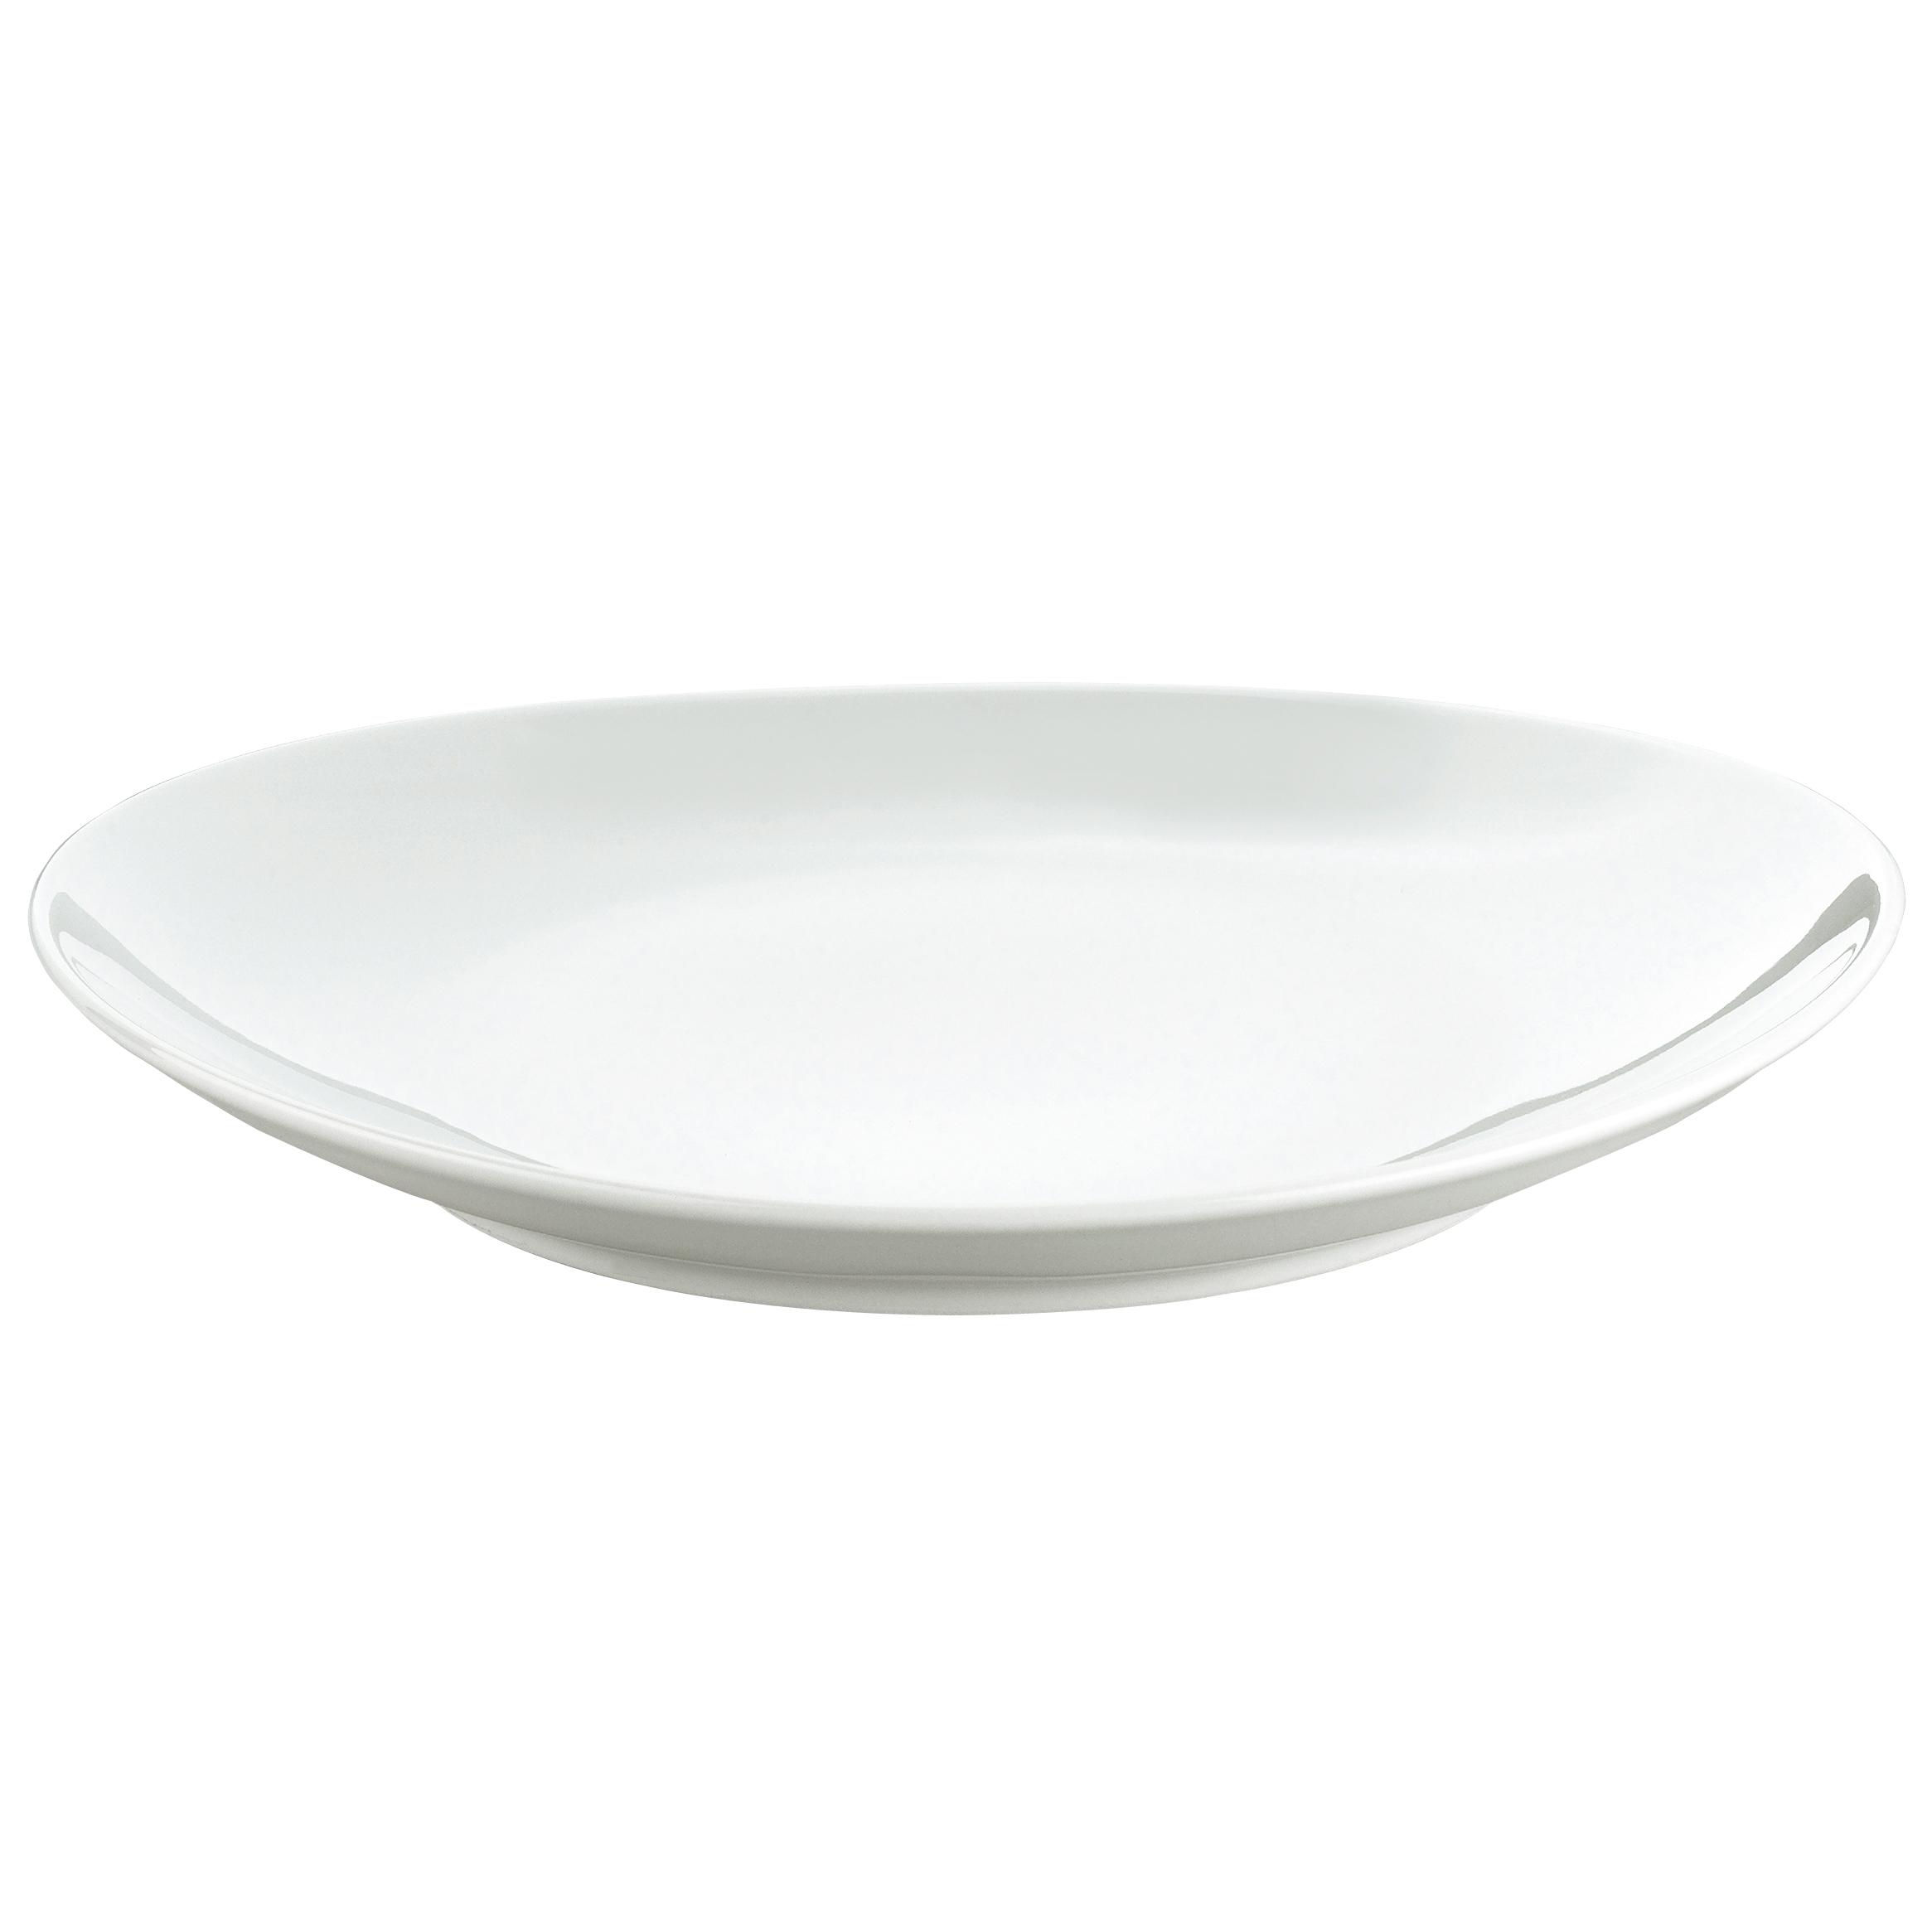 Stektallrik oval stor 295 cm